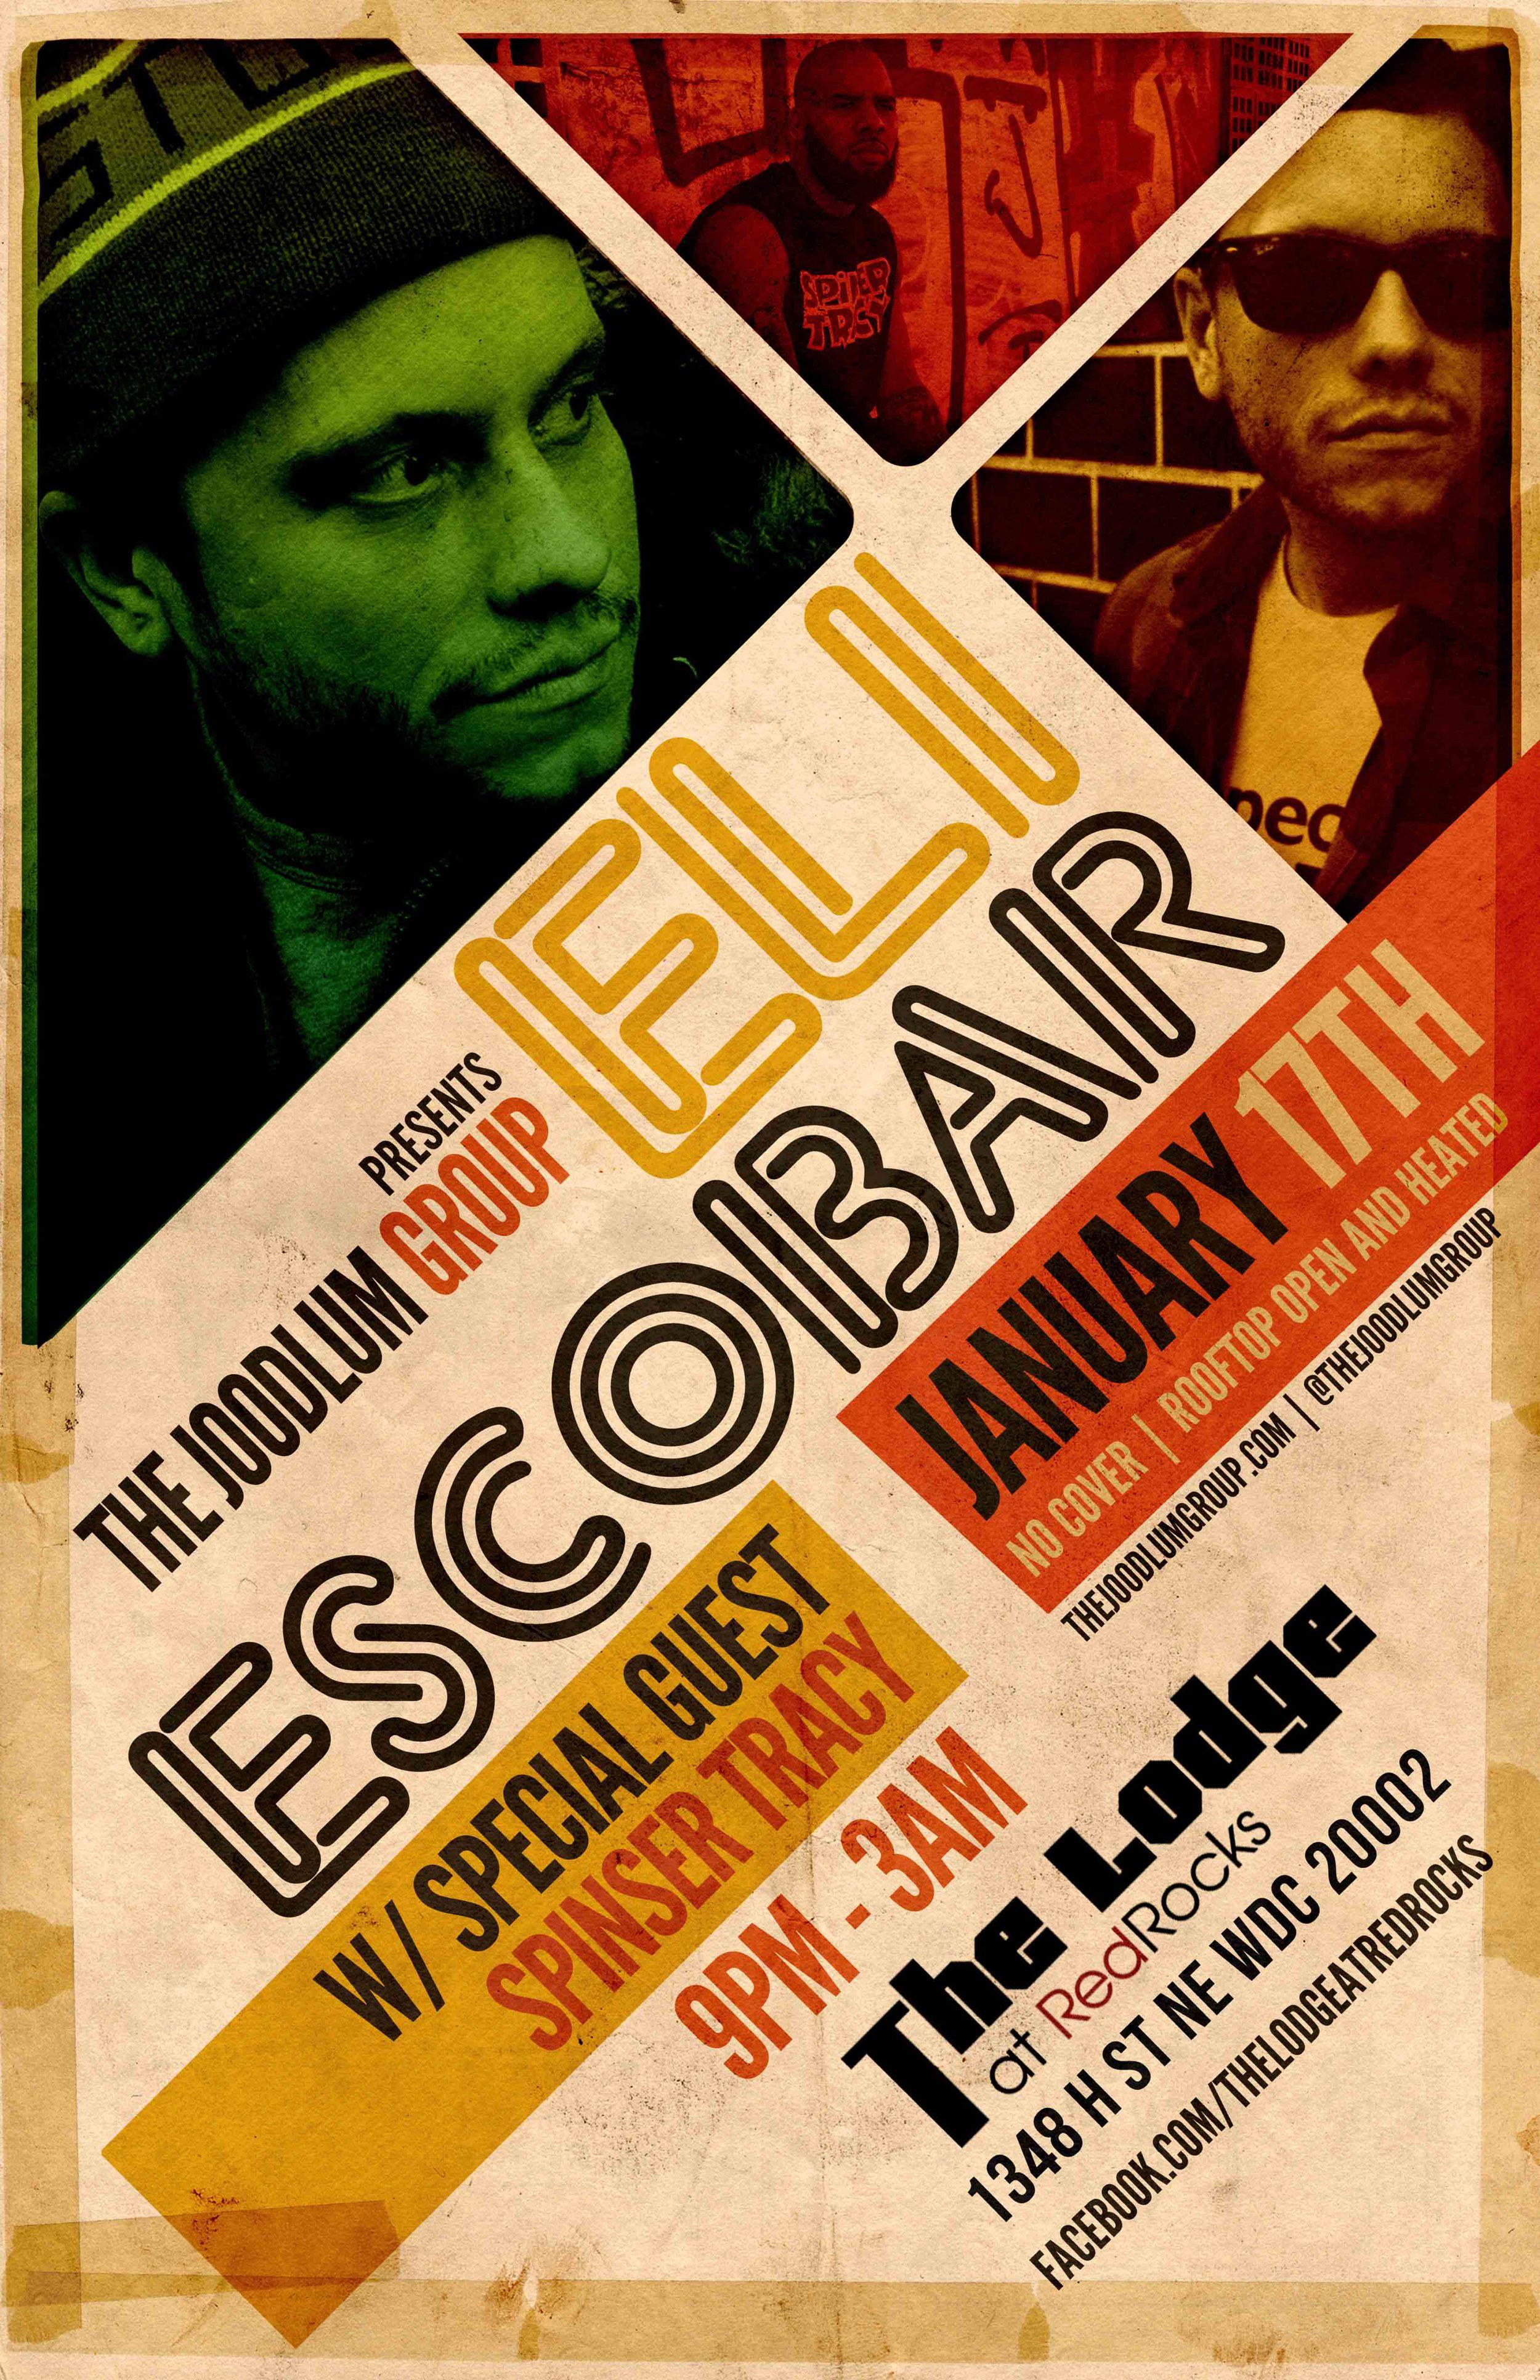 Eli Escobar 1-17-15 poster.jpg